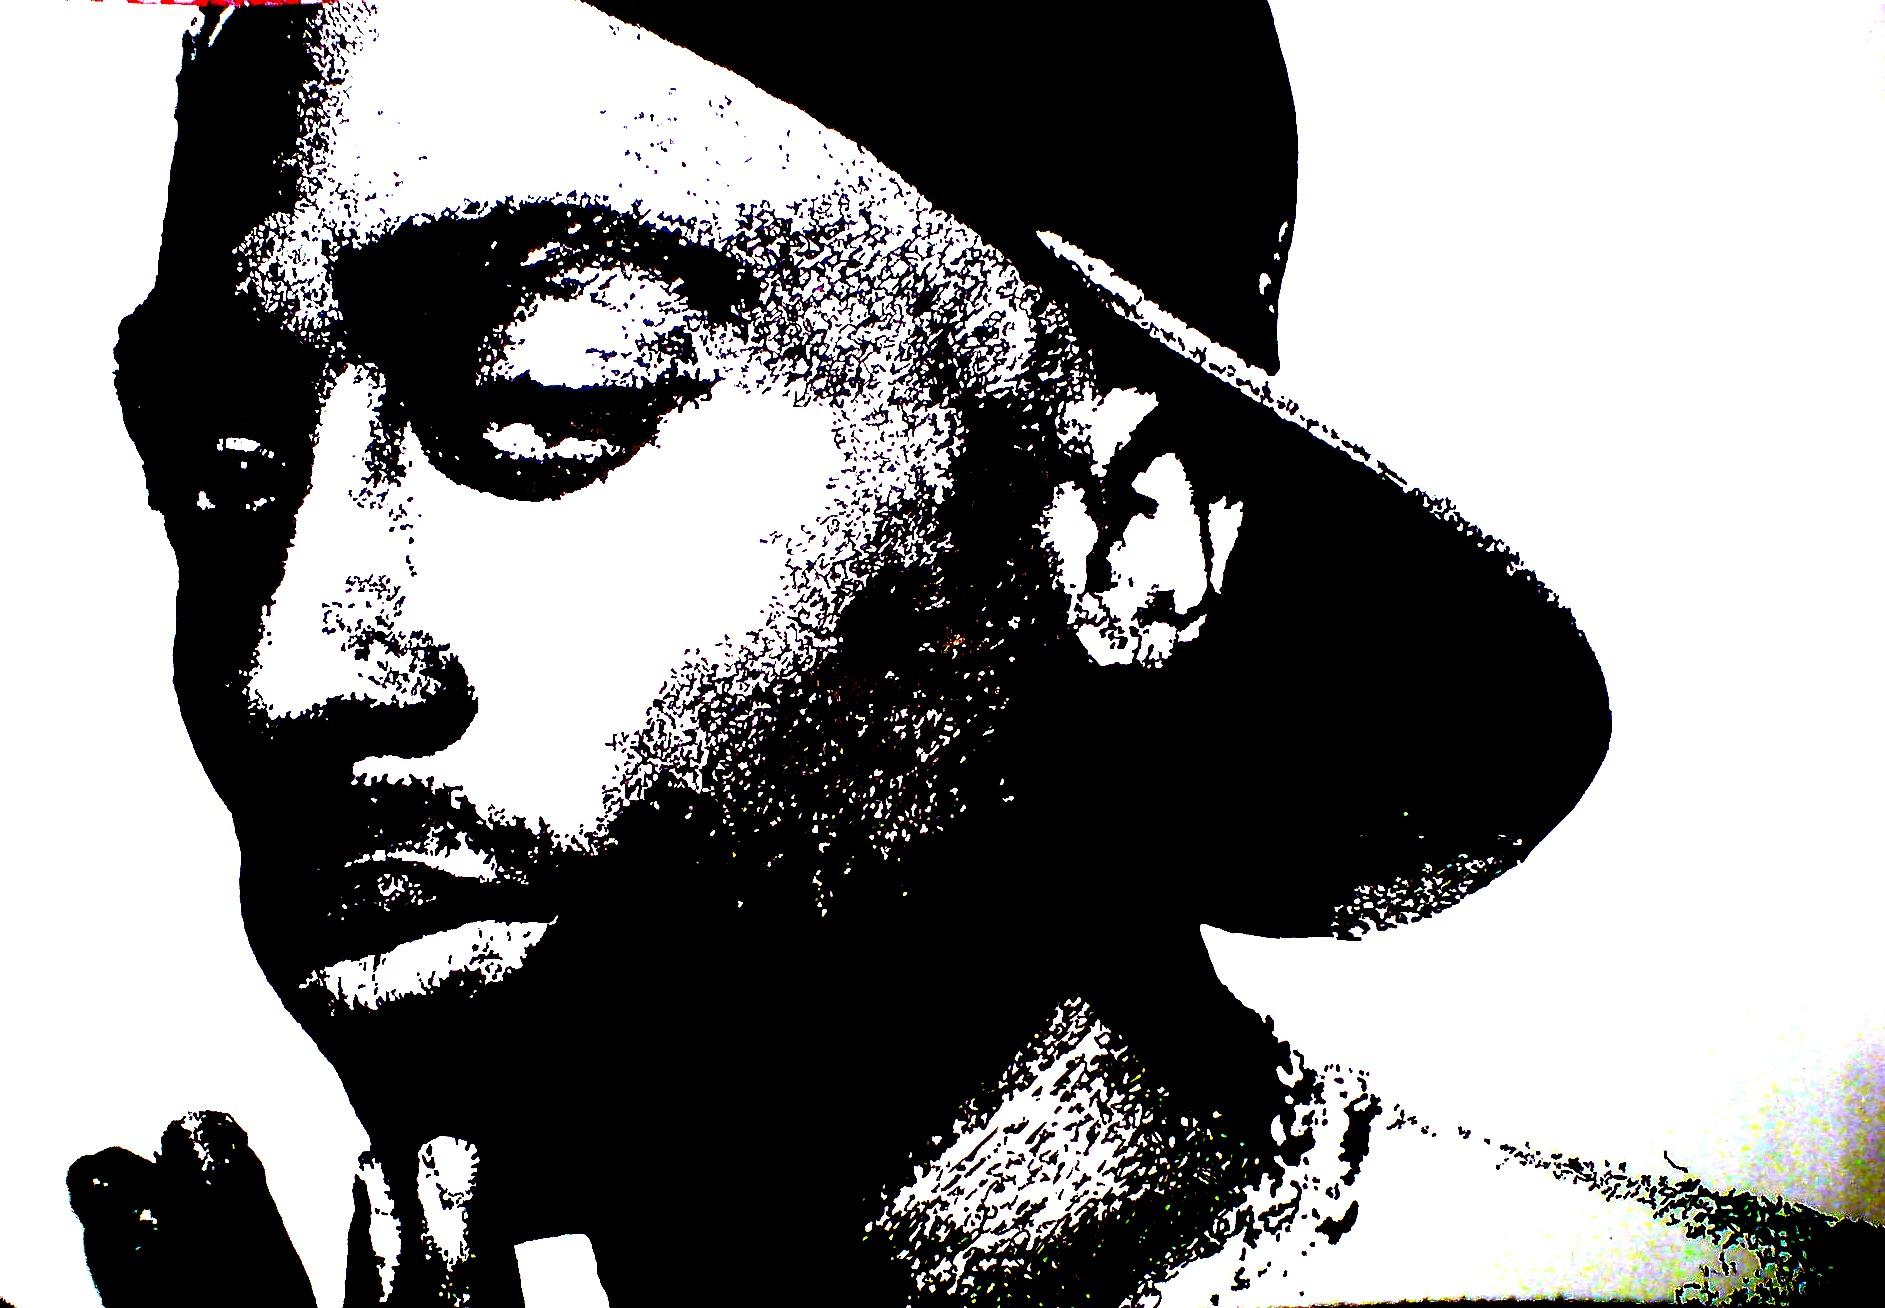 Tupac Artwork 44 By 00Makaveli00 On DeviantArt